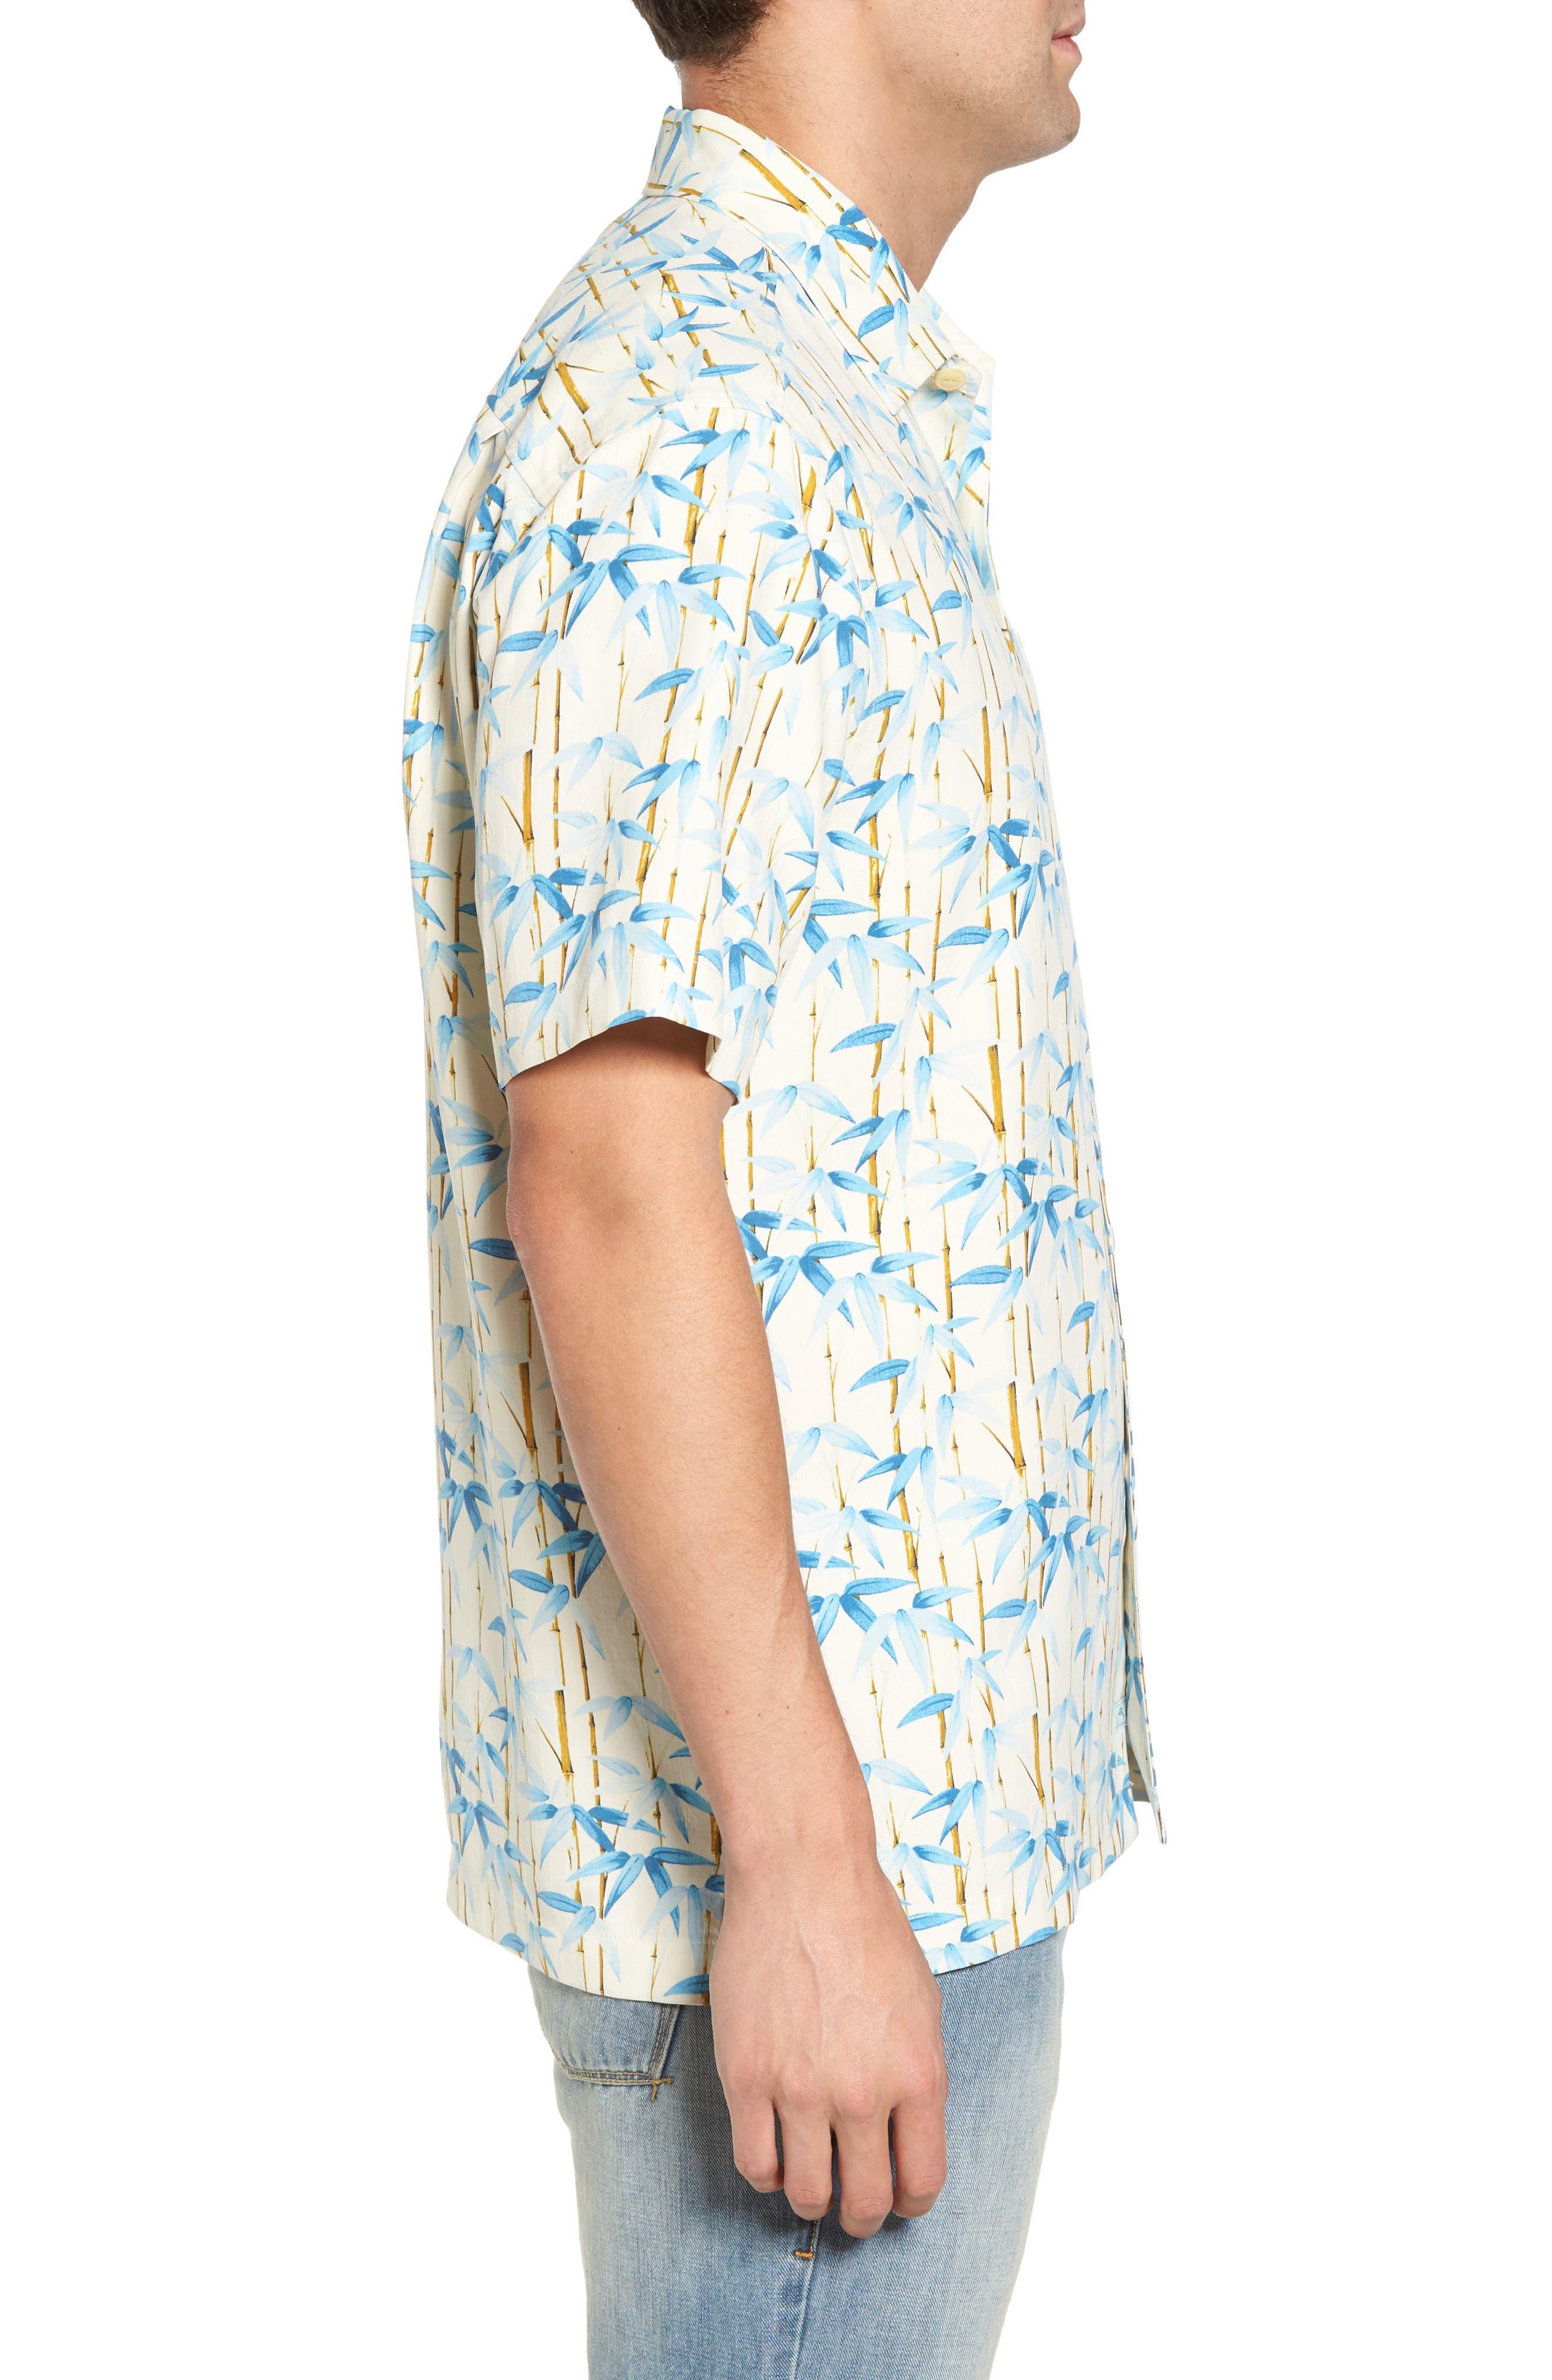 TOMMY BAHAMA,                             Forest Print Silk Sport Shirt,                             Alternate thumbnail 3, color,                             100